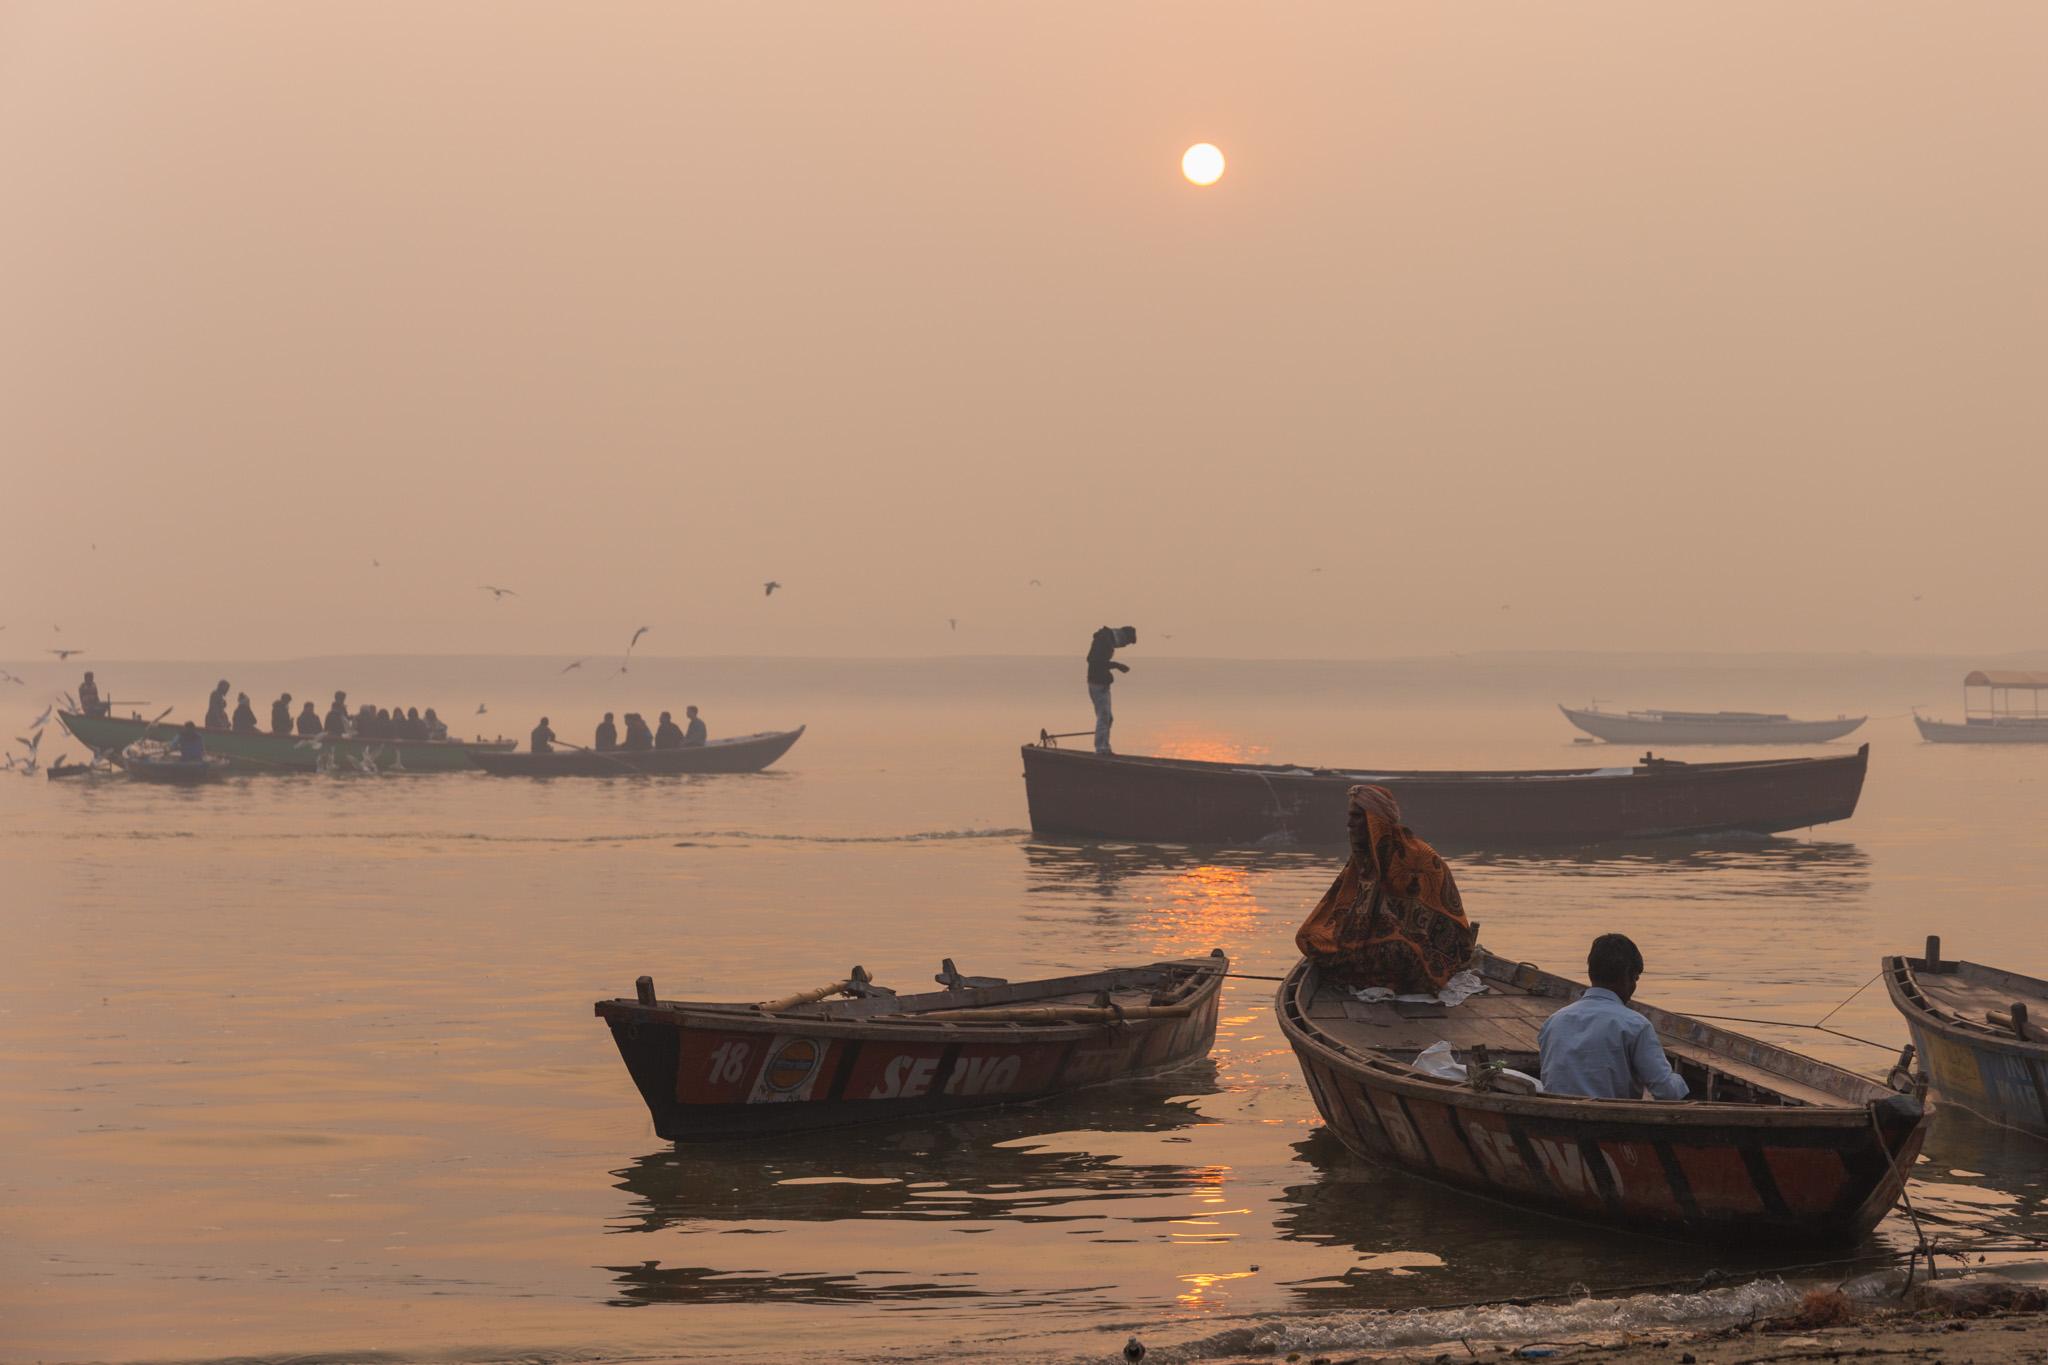 Sunrise on the river Ganges.